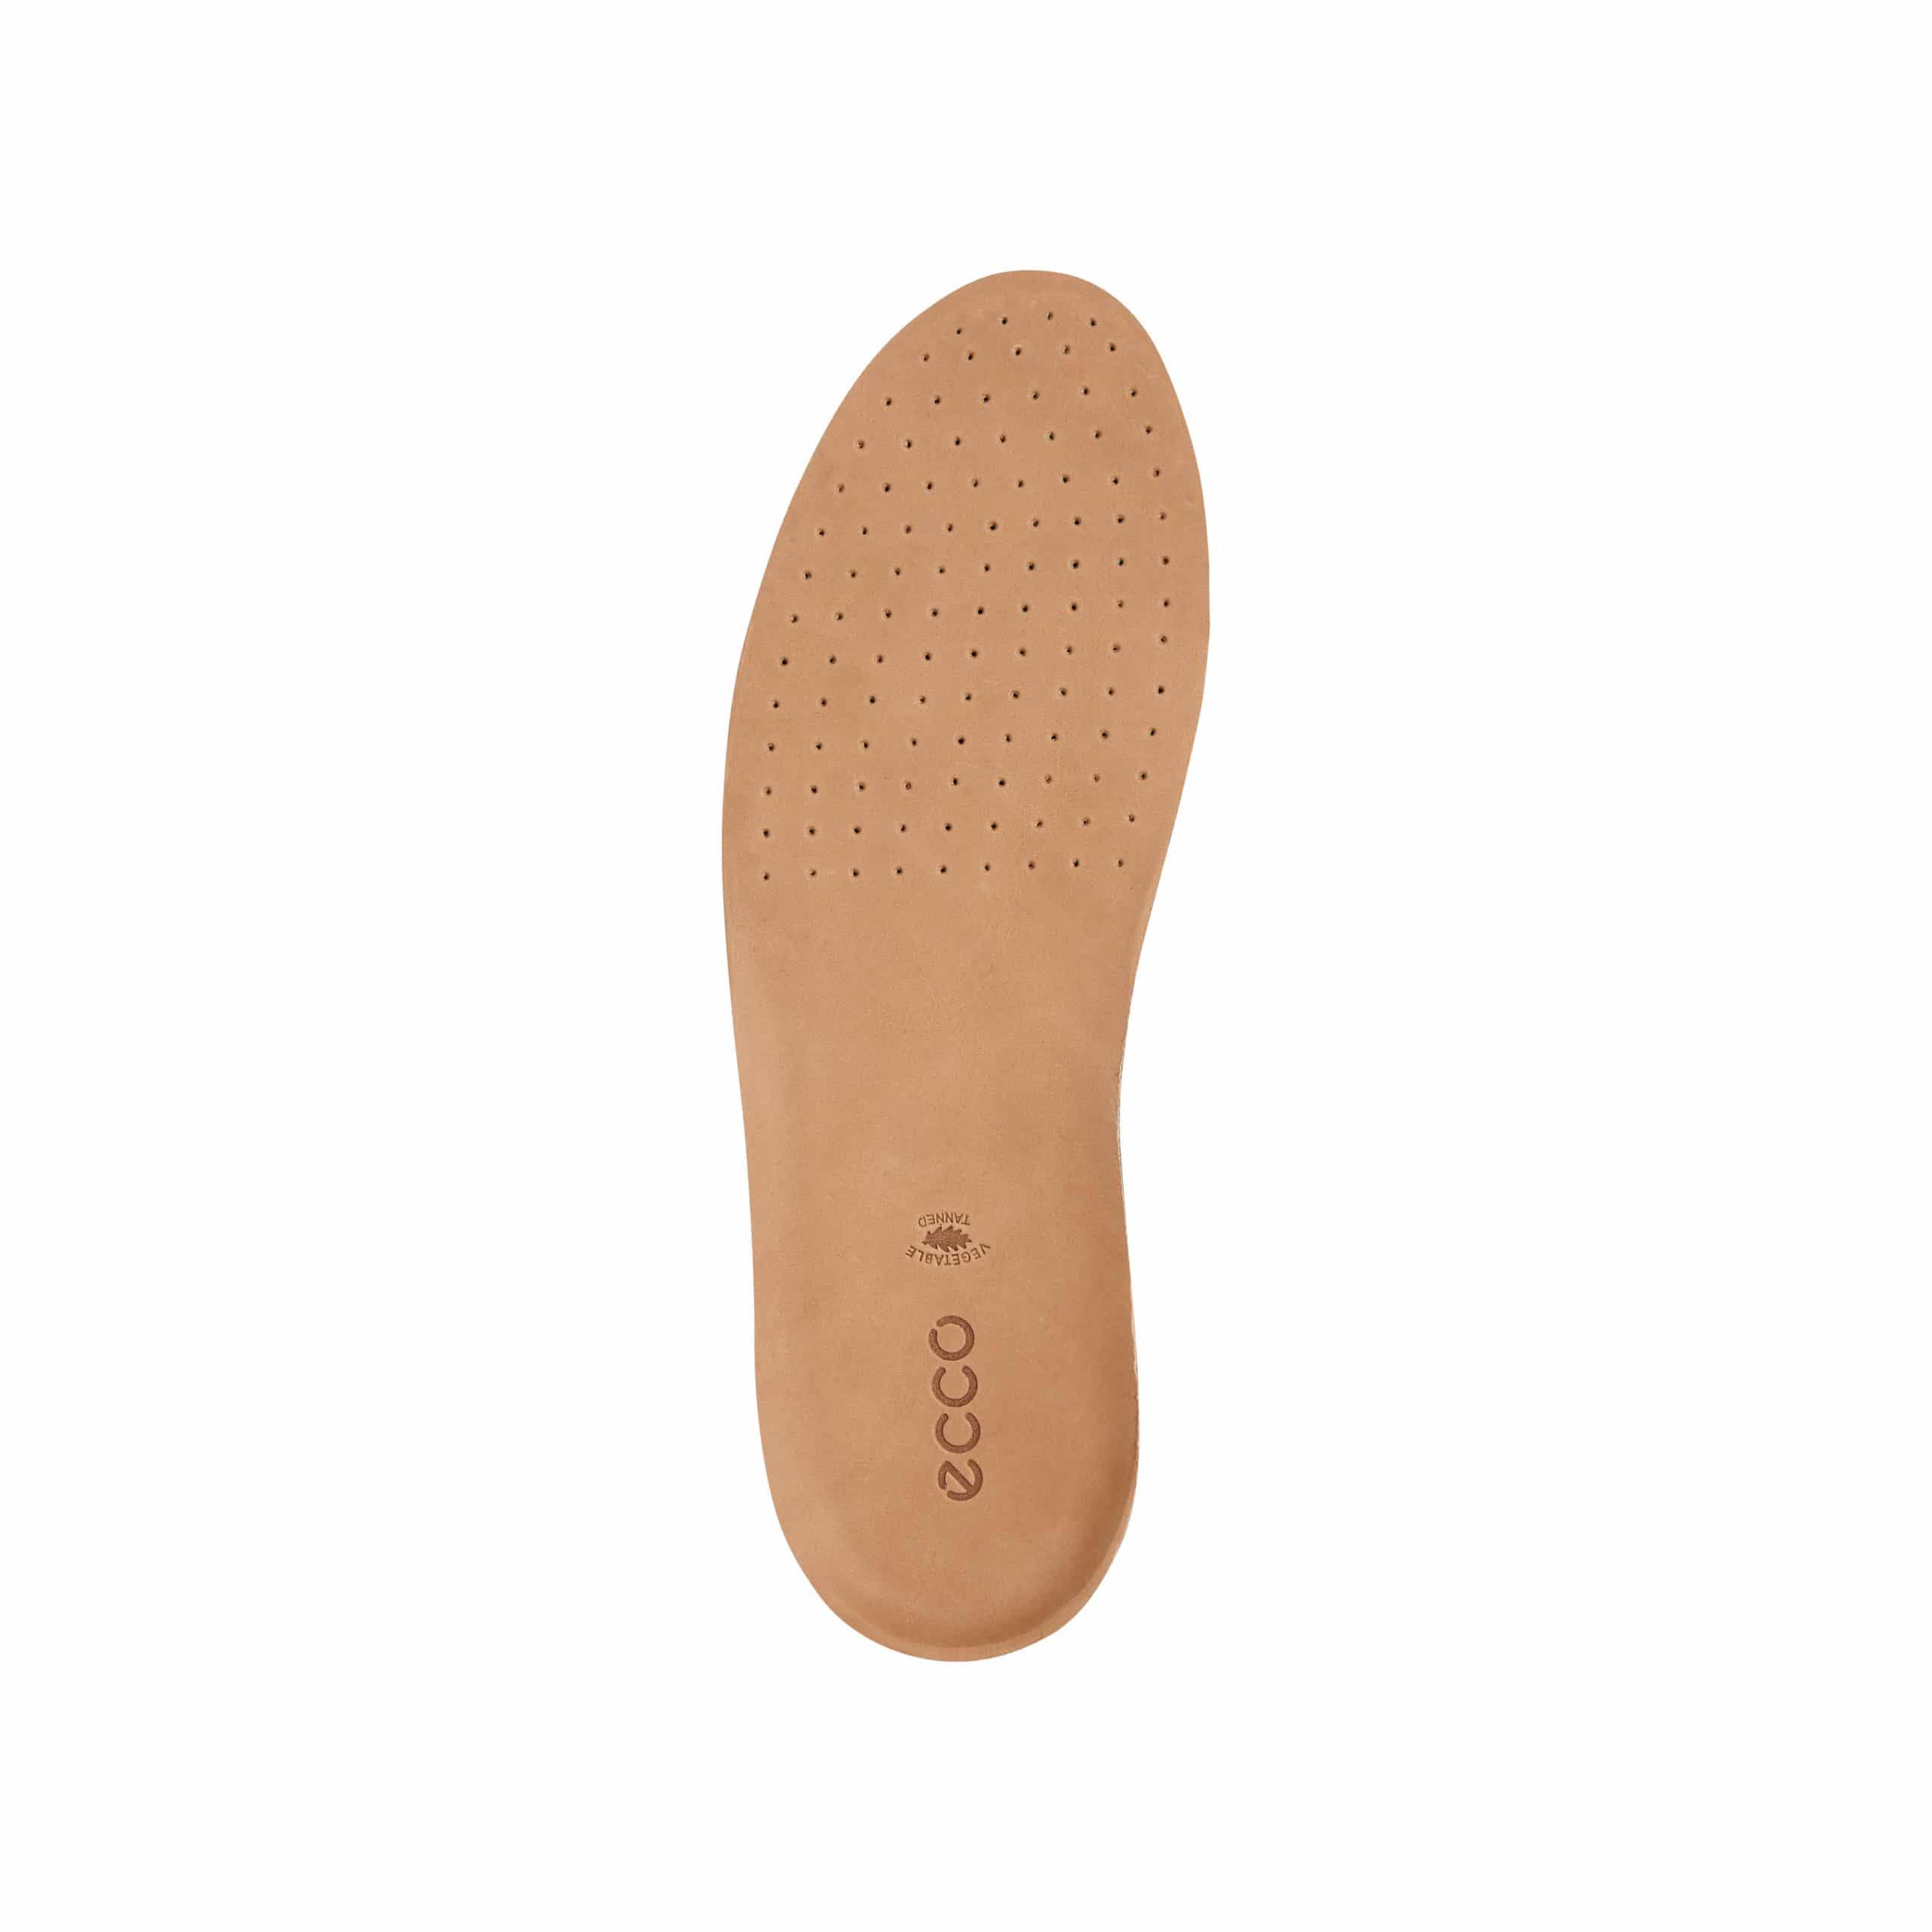 Insoles Archives - ECCO Shoes for Men